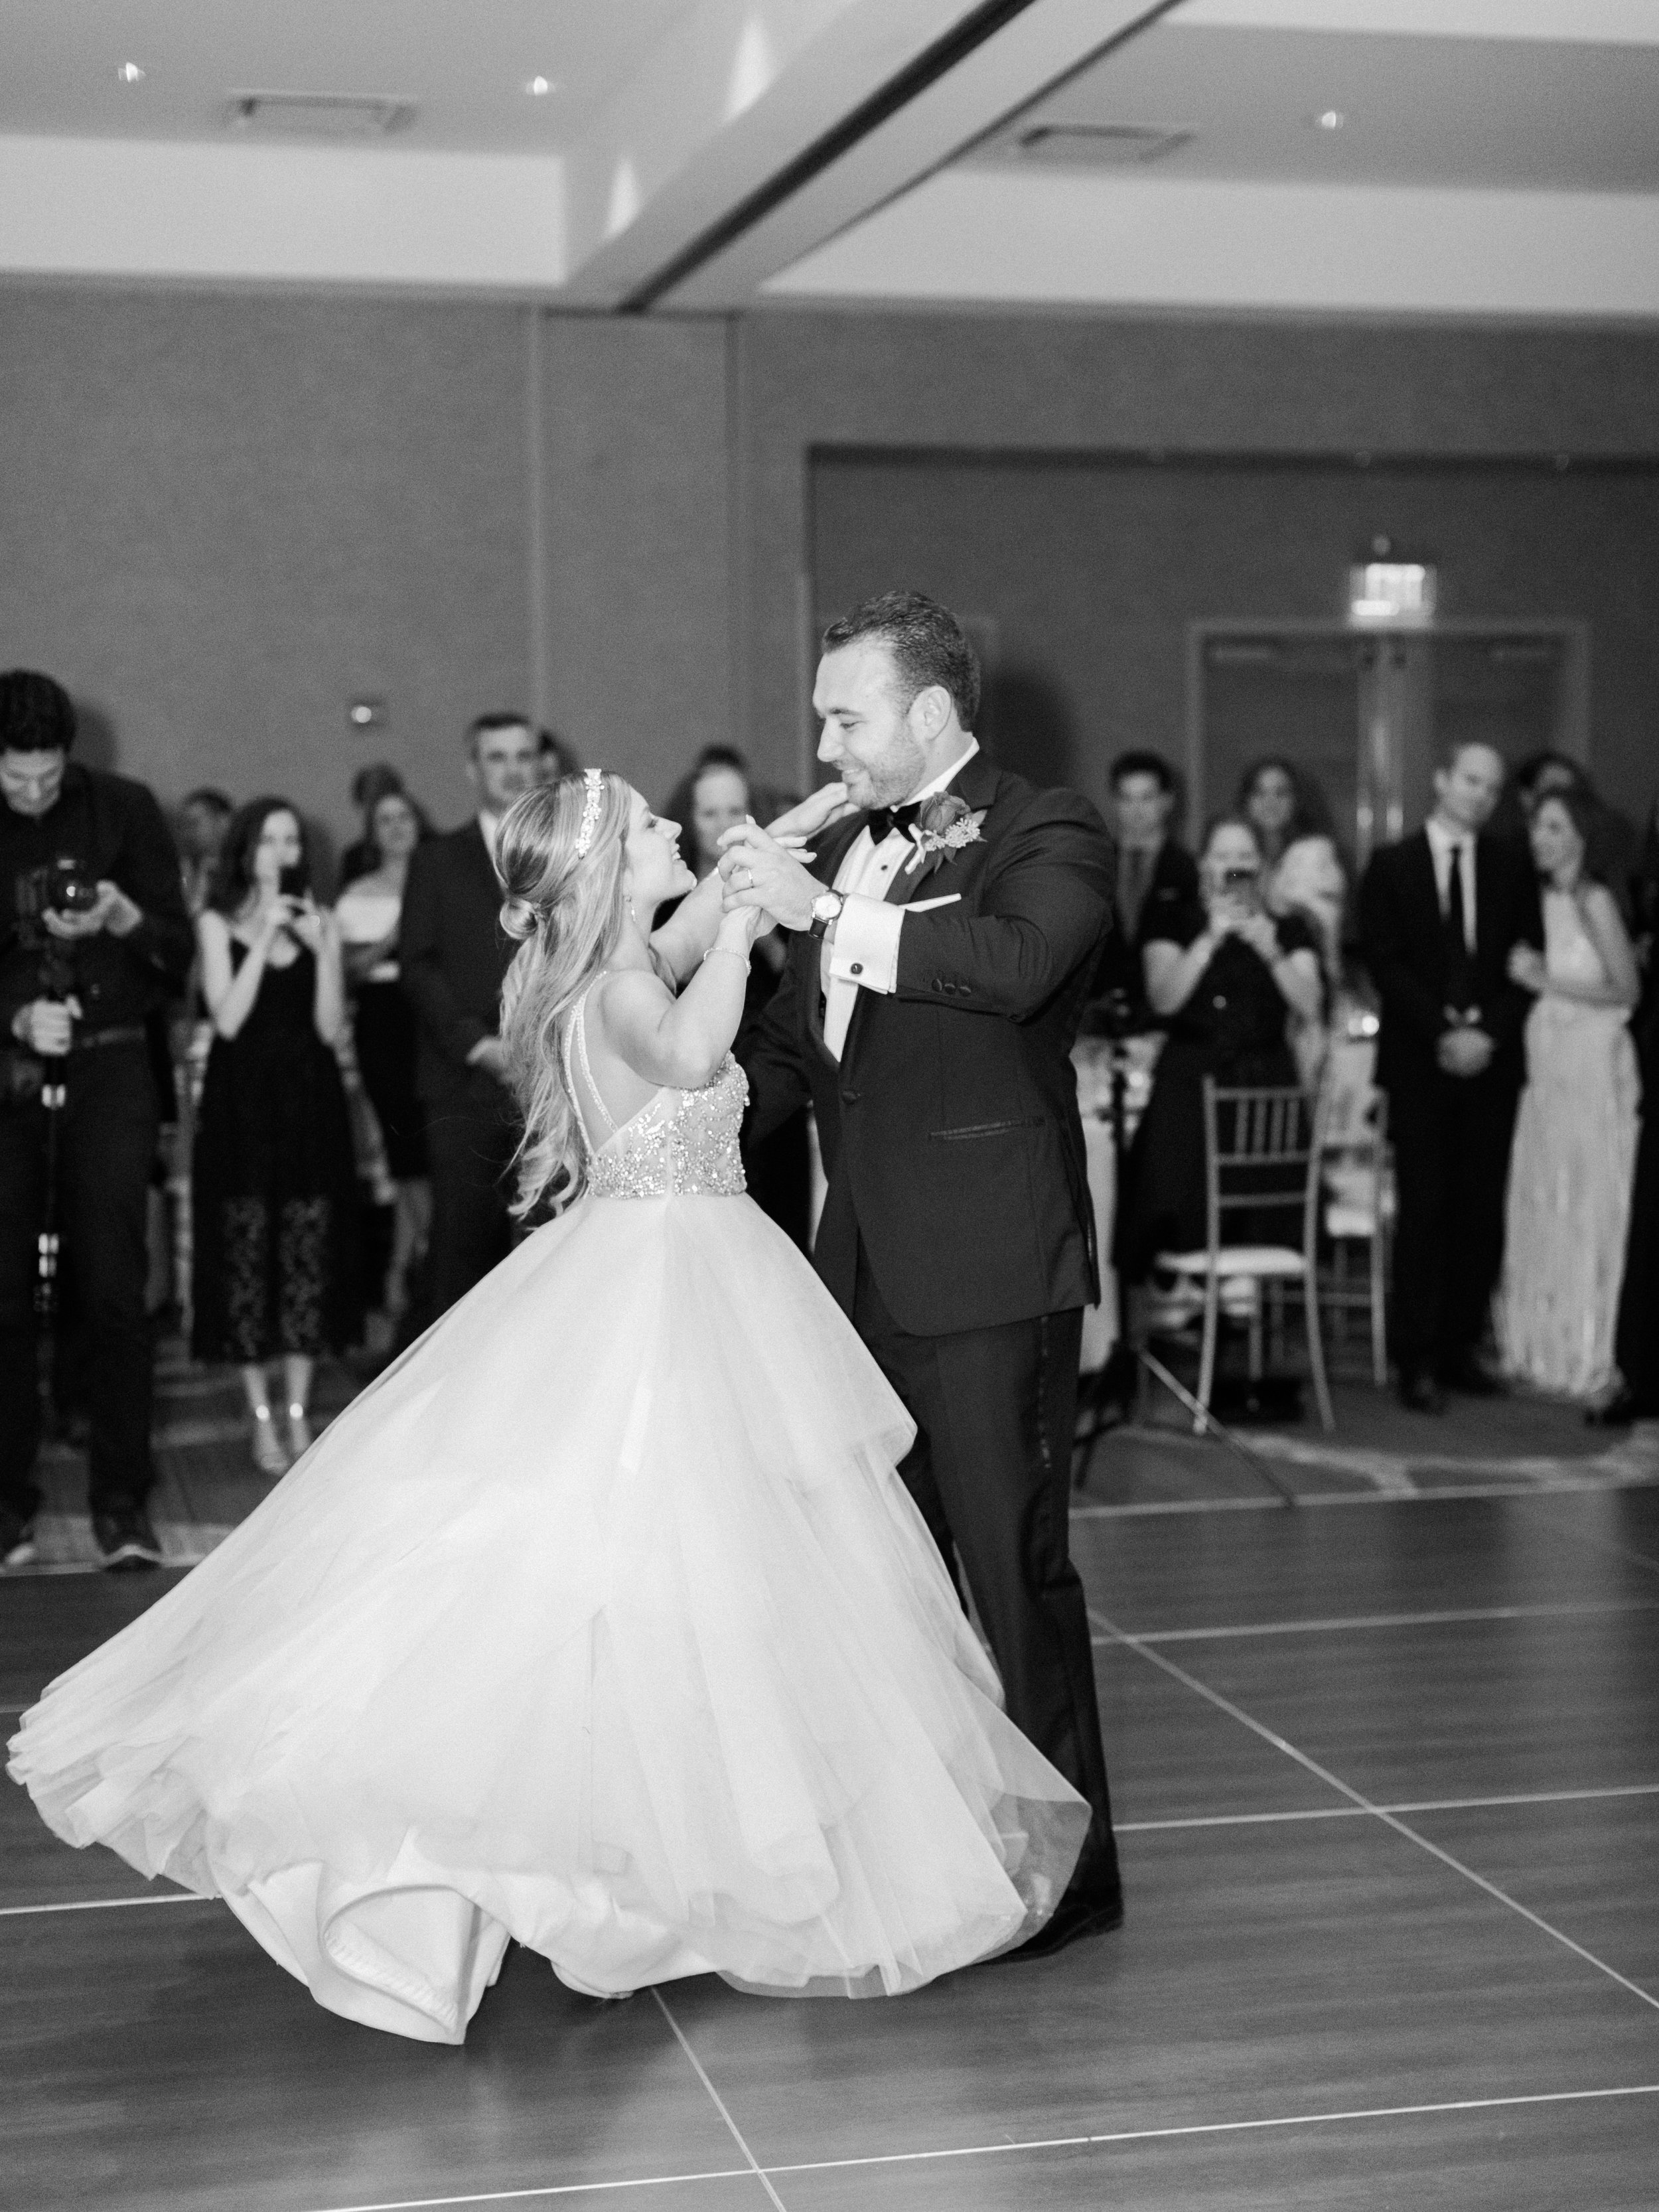 hyatt-regency-jersey-city-wedding-photographer68.jpg